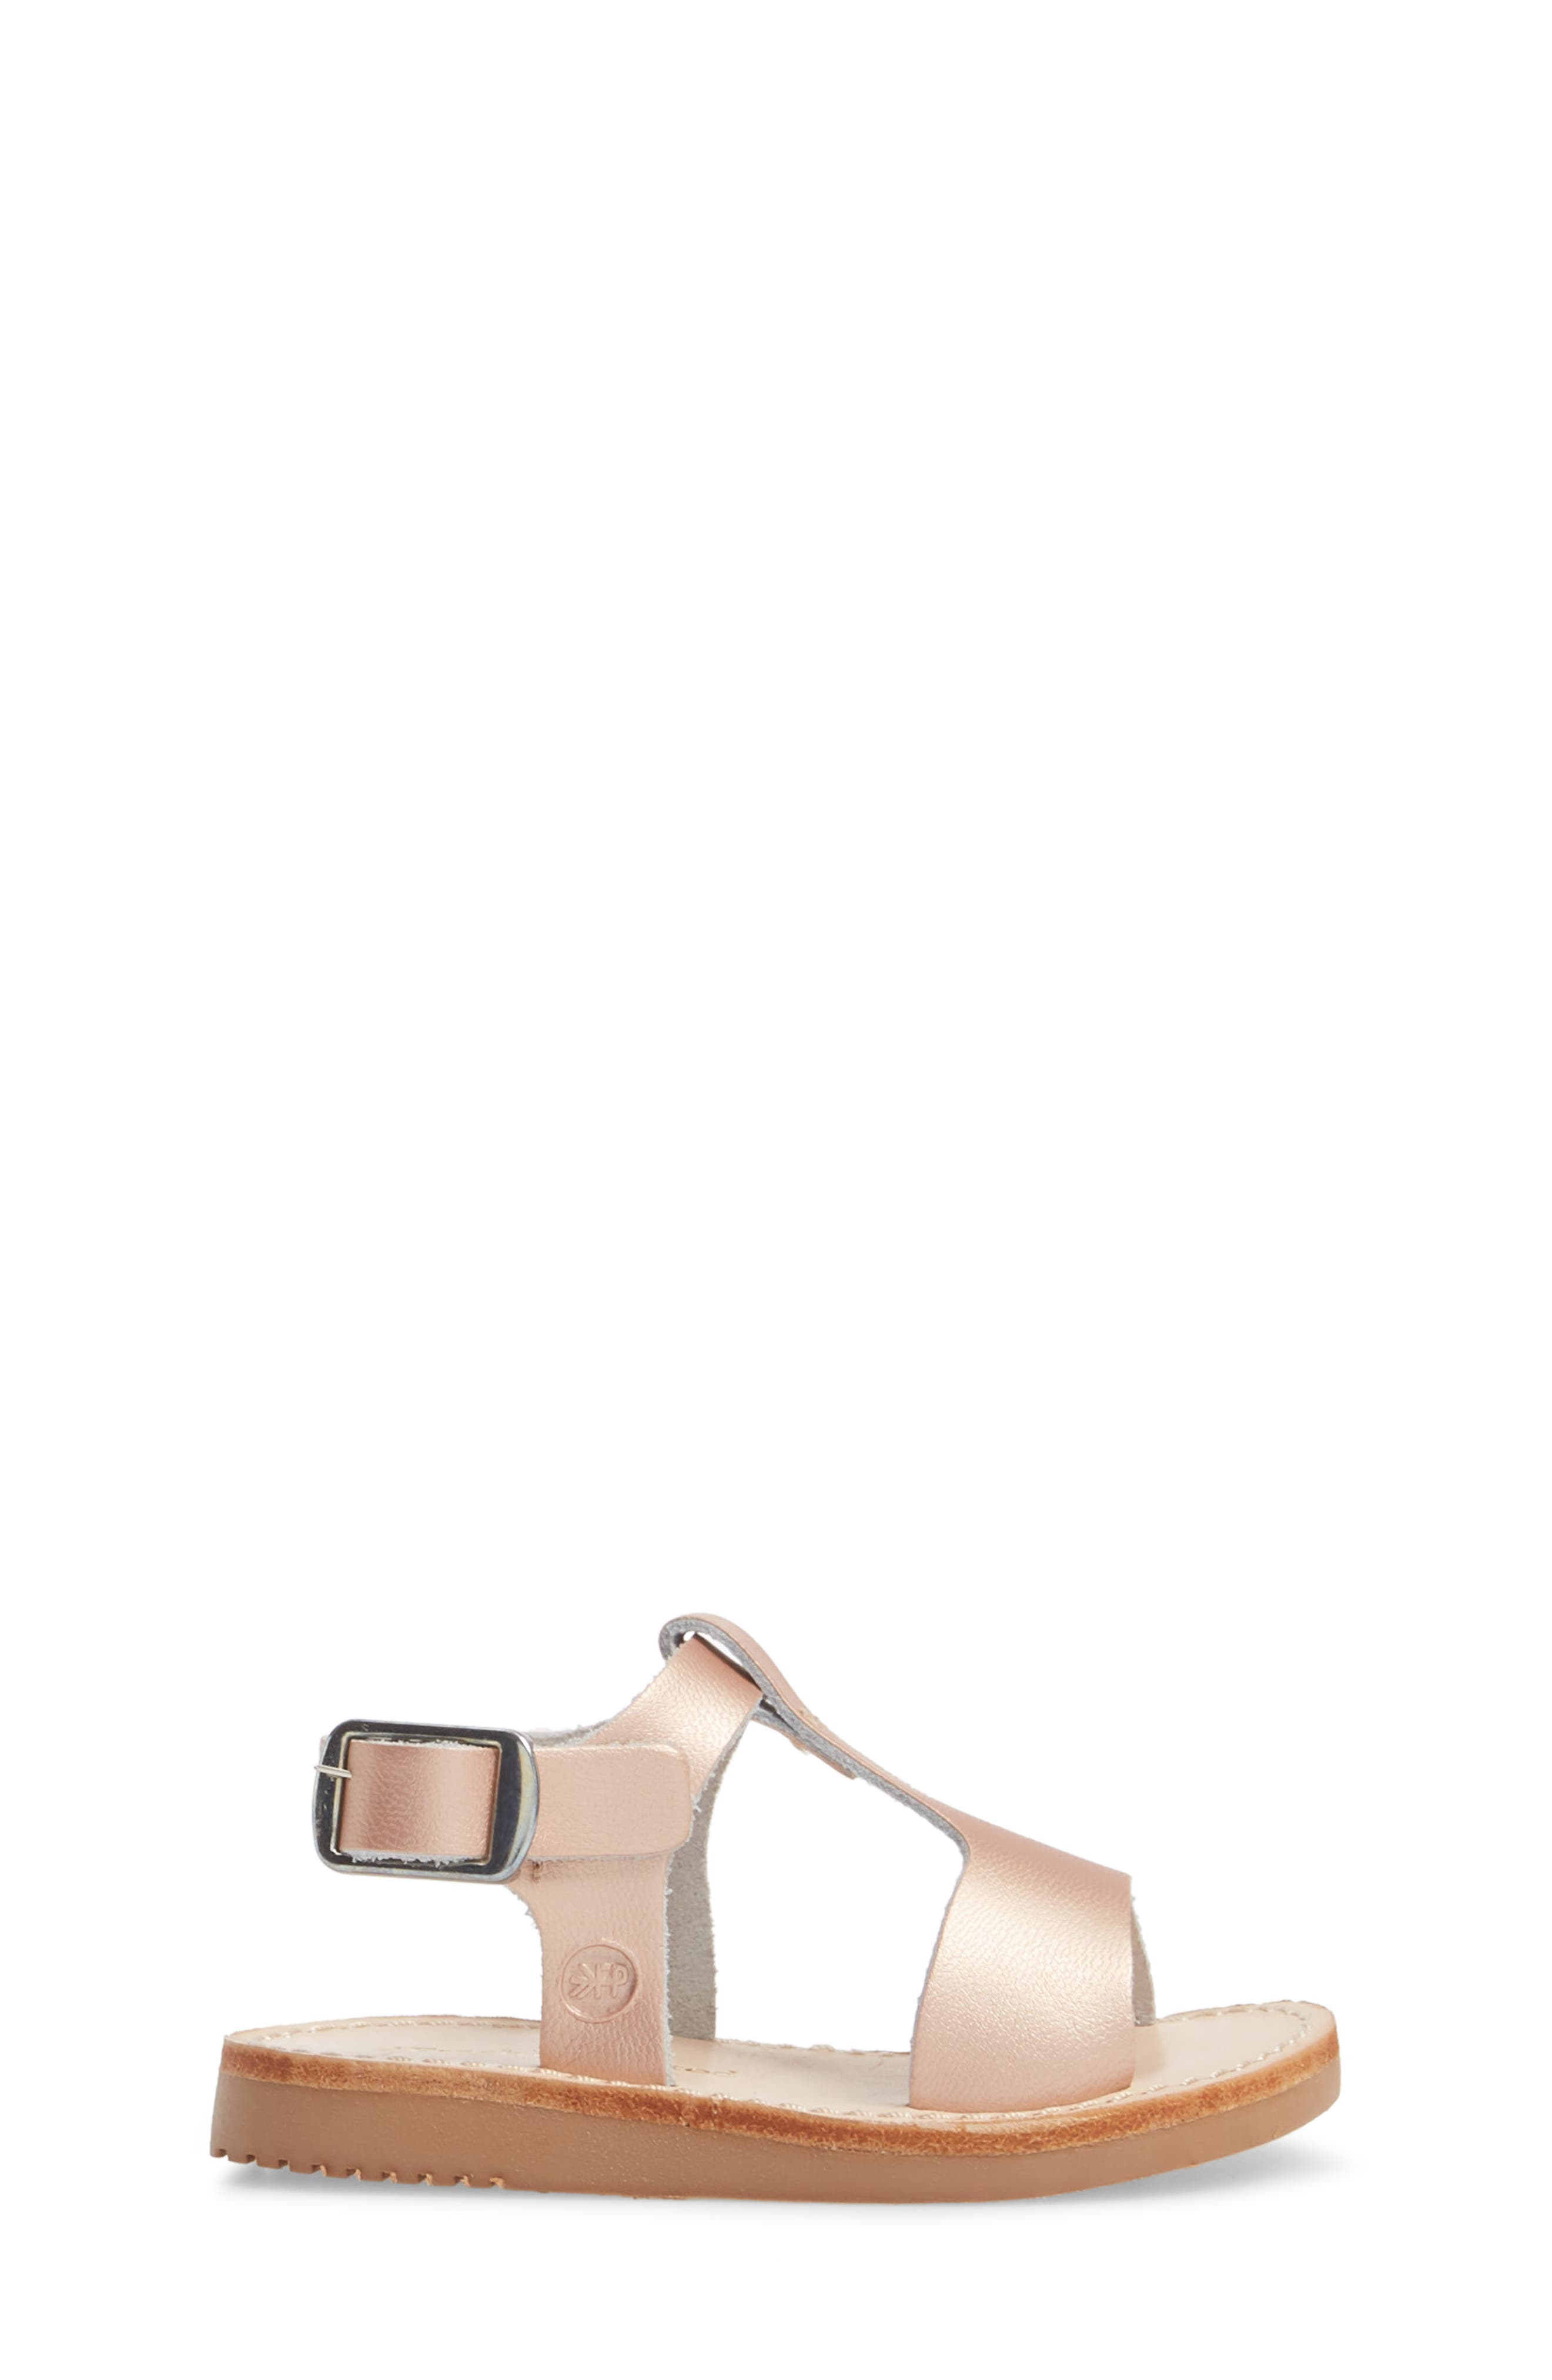 Malibu Water Resistant Sandal,                             Alternate thumbnail 3, color,                             ROSE GOLD